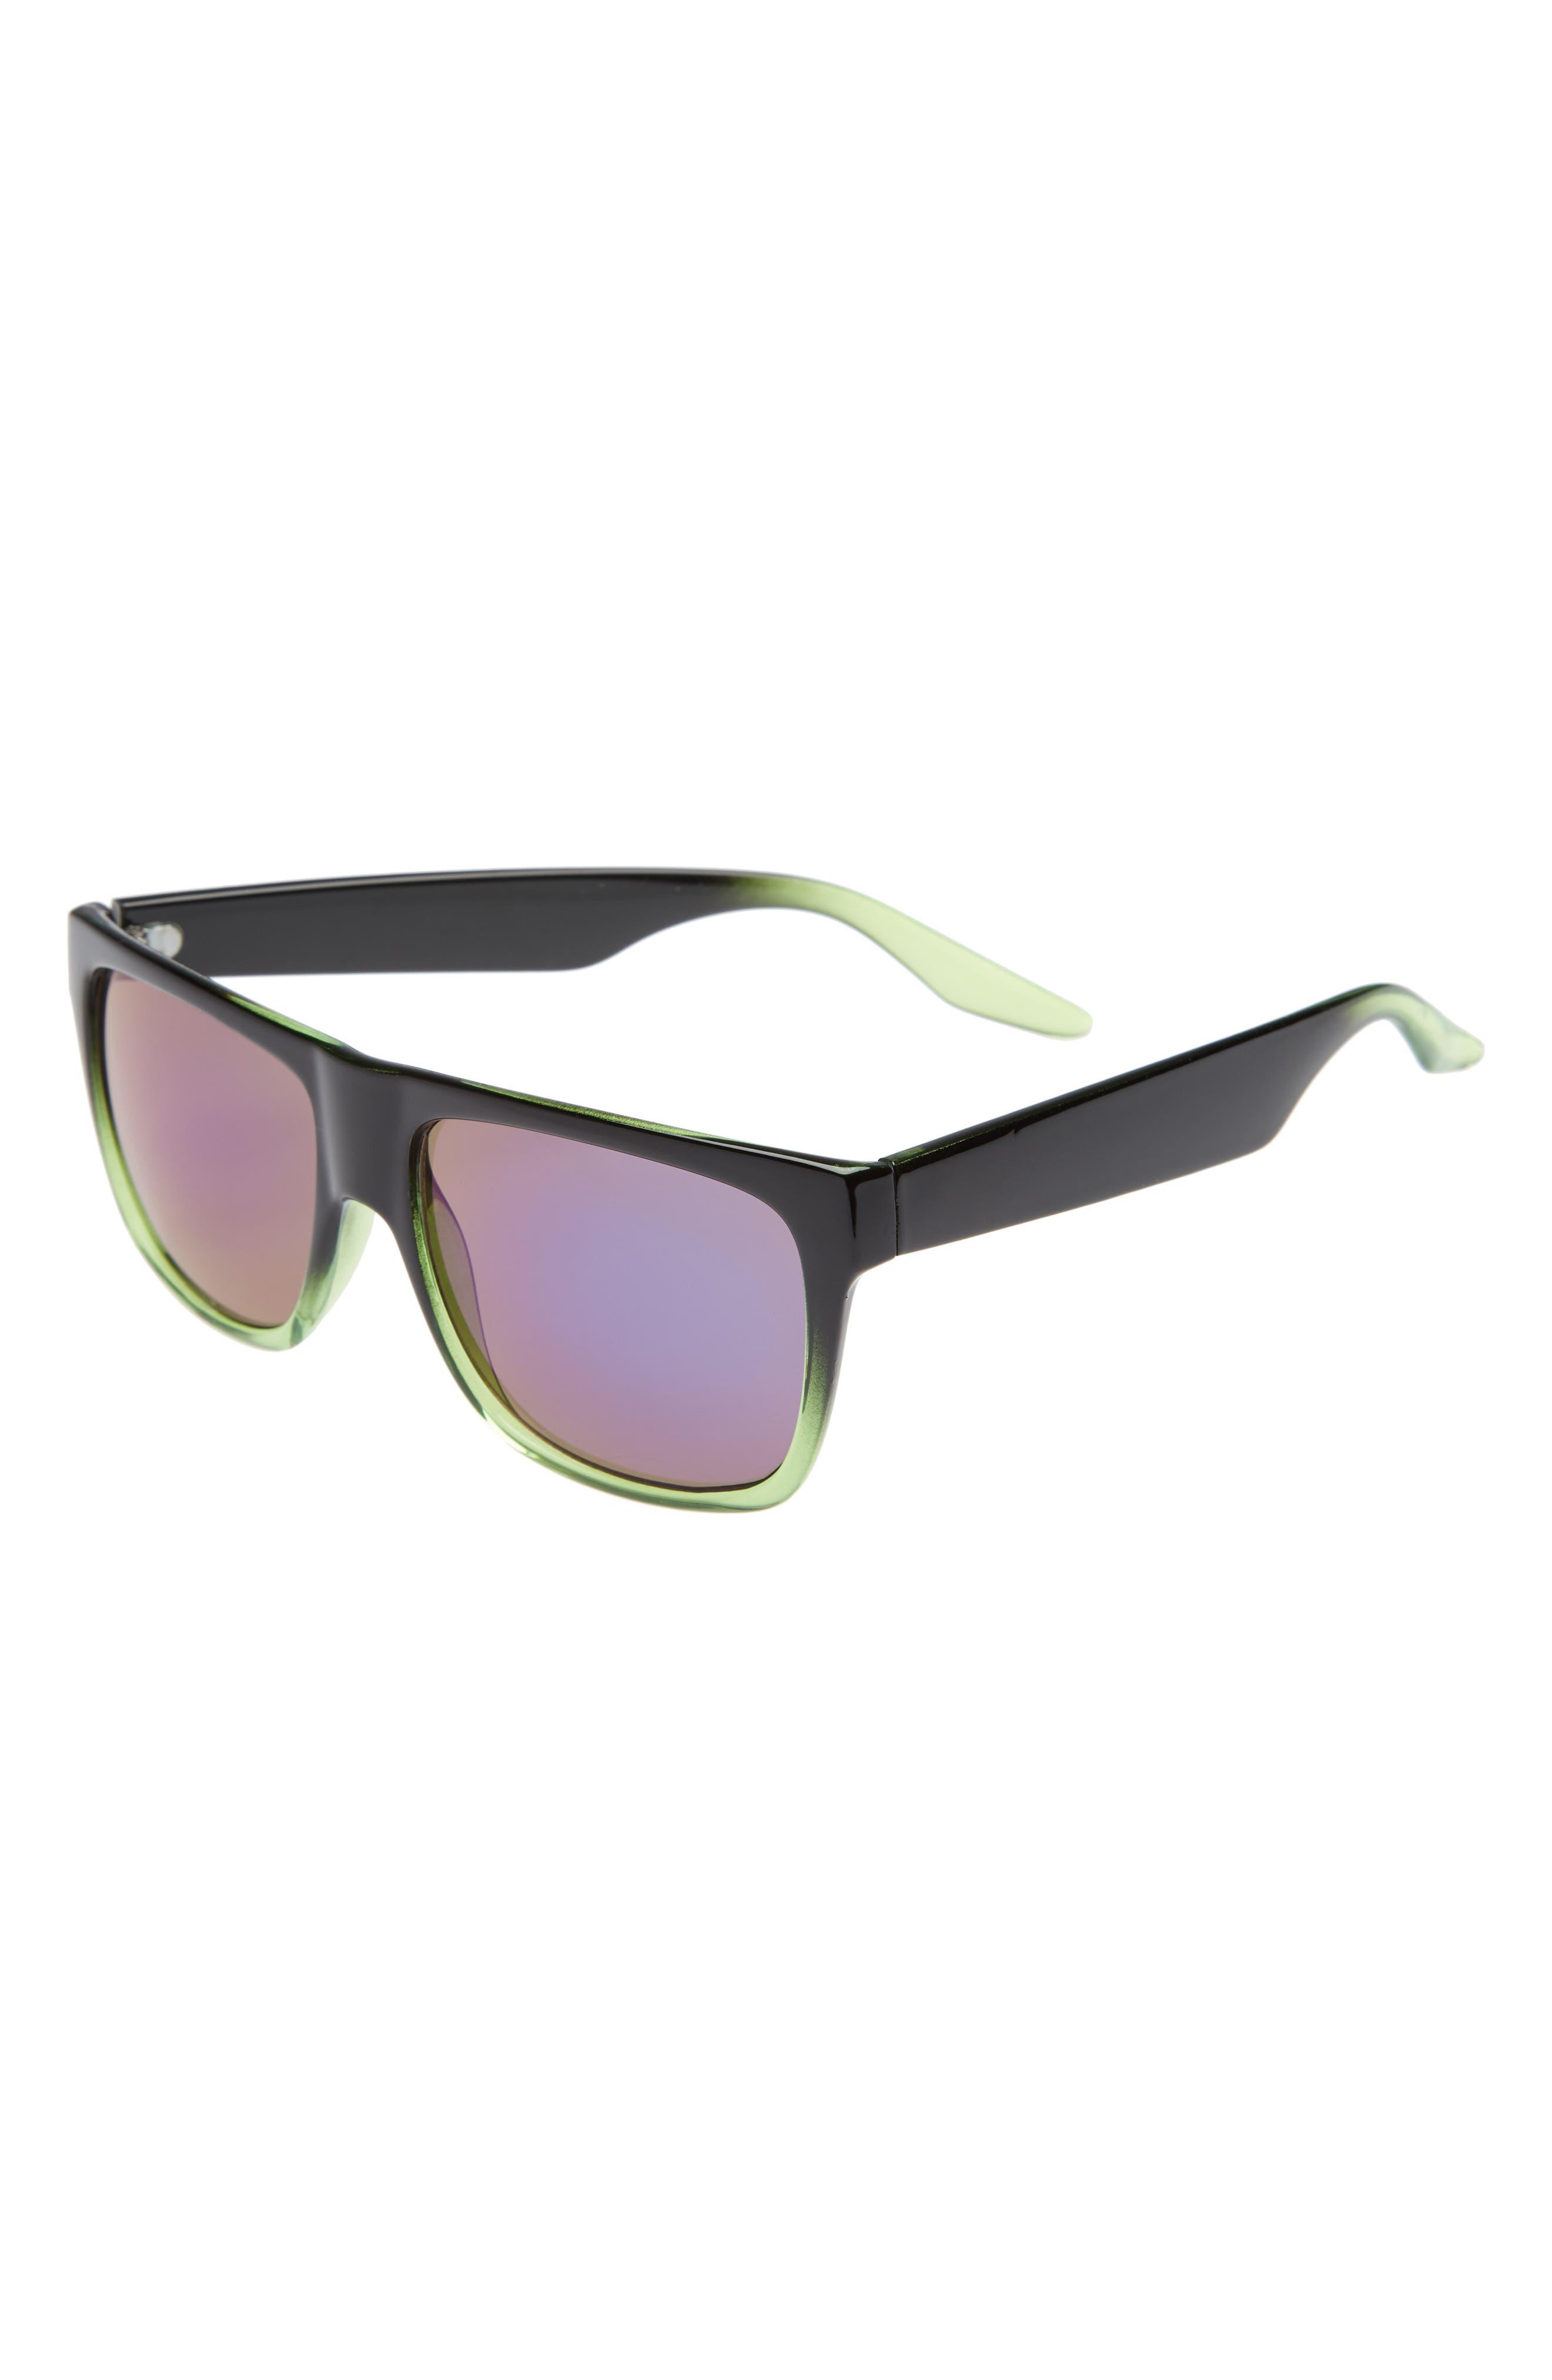 Ombré Frame Sunglasses,                             Main thumbnail 1, color,                             Black/ Green Mirror